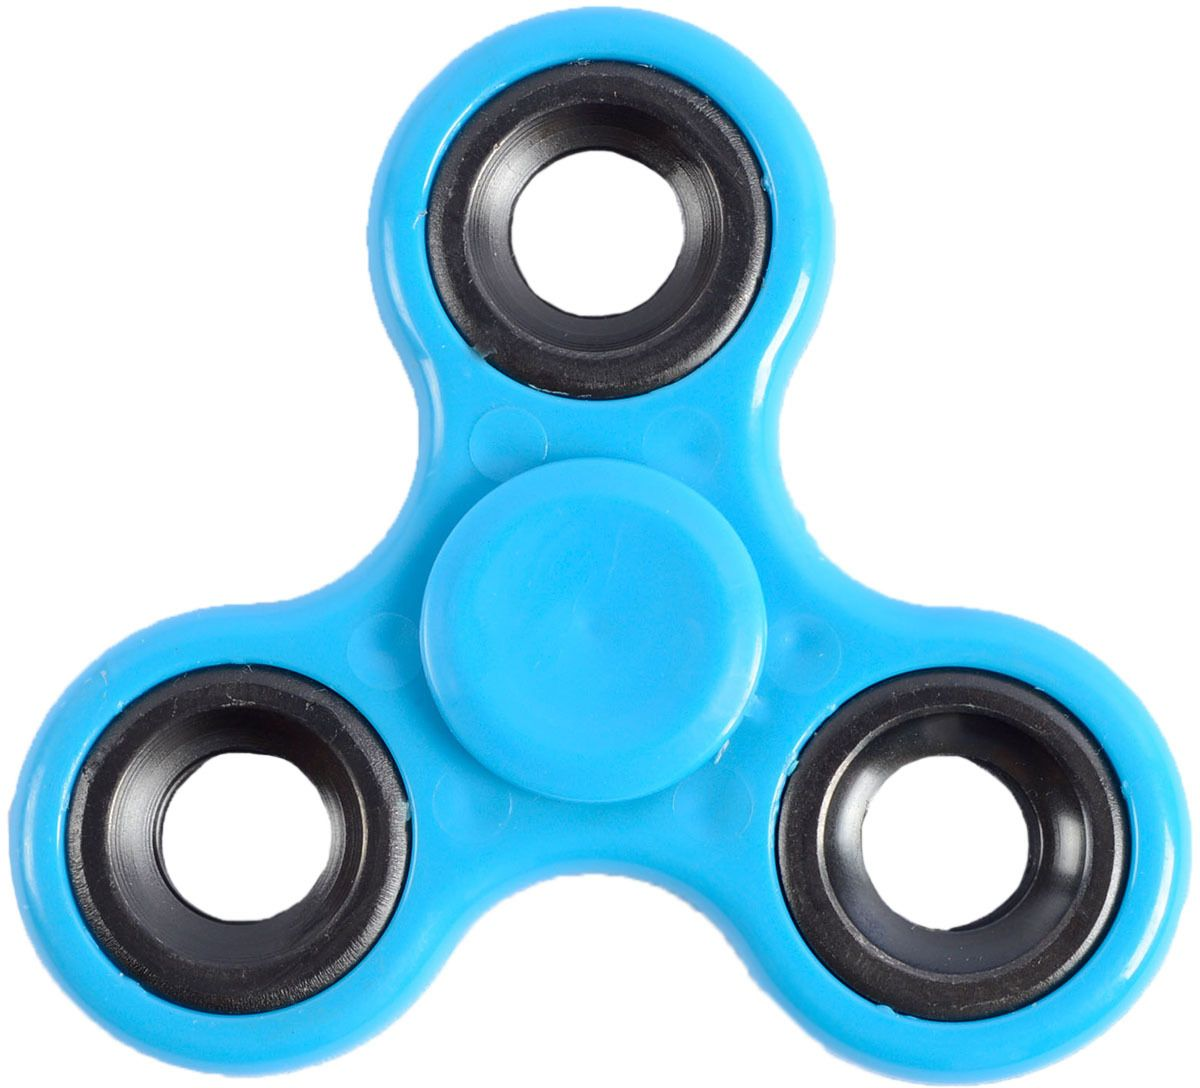 Fidget Spinner Спиннер Gyro цвет синий спиннер fidget spinner megamind м7216 deluxe edition pink